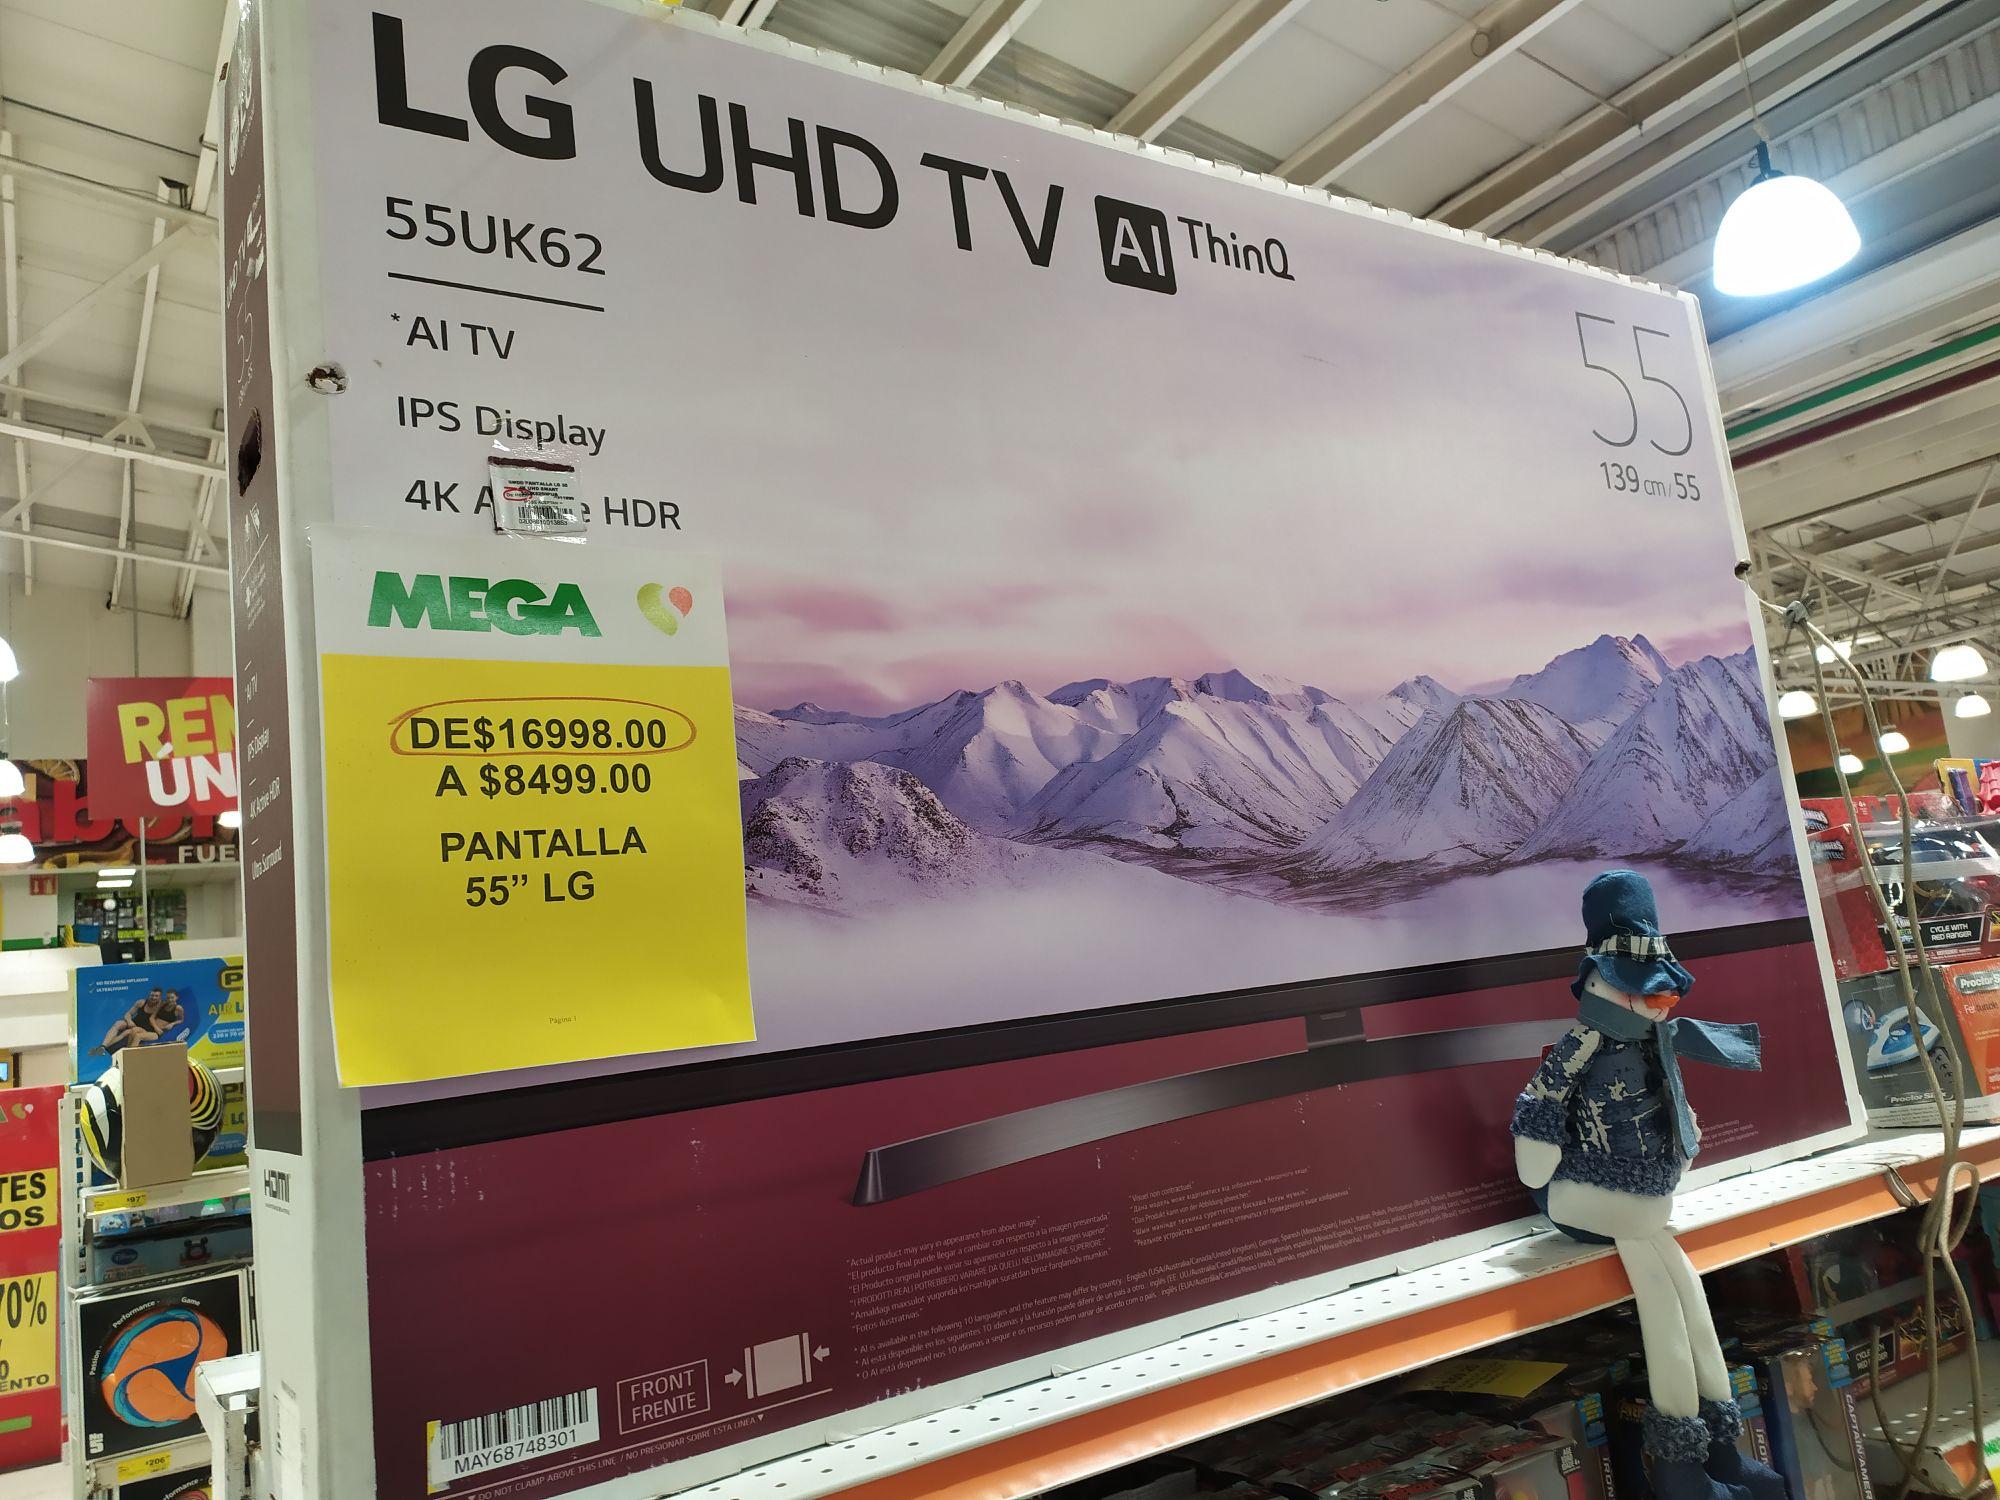 "Mega: Pantalla LG 55UK62 de 55"""